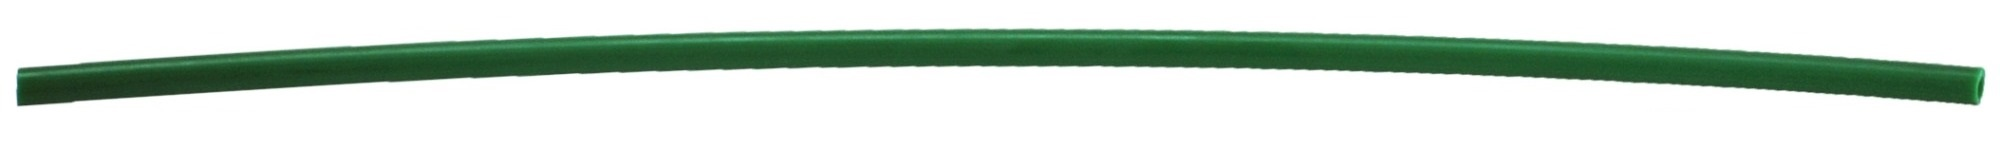 Paintball Macroline Hose 1 Foot Green by Ninja